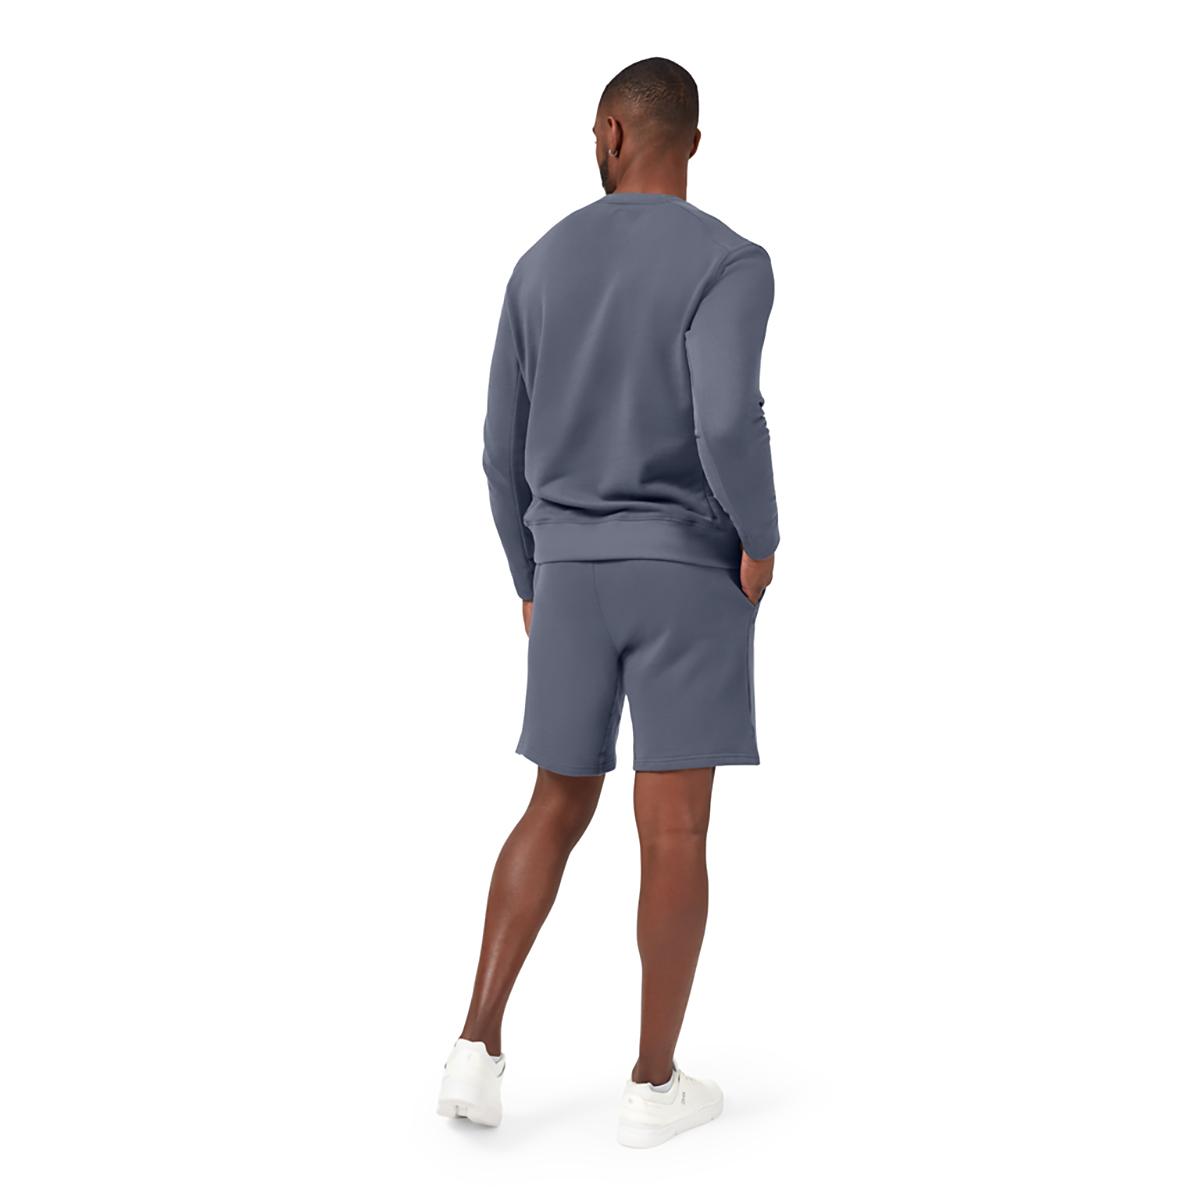 Men's On Sweat Shorts - Color: Dark - Size: S, Dark, large, image 2